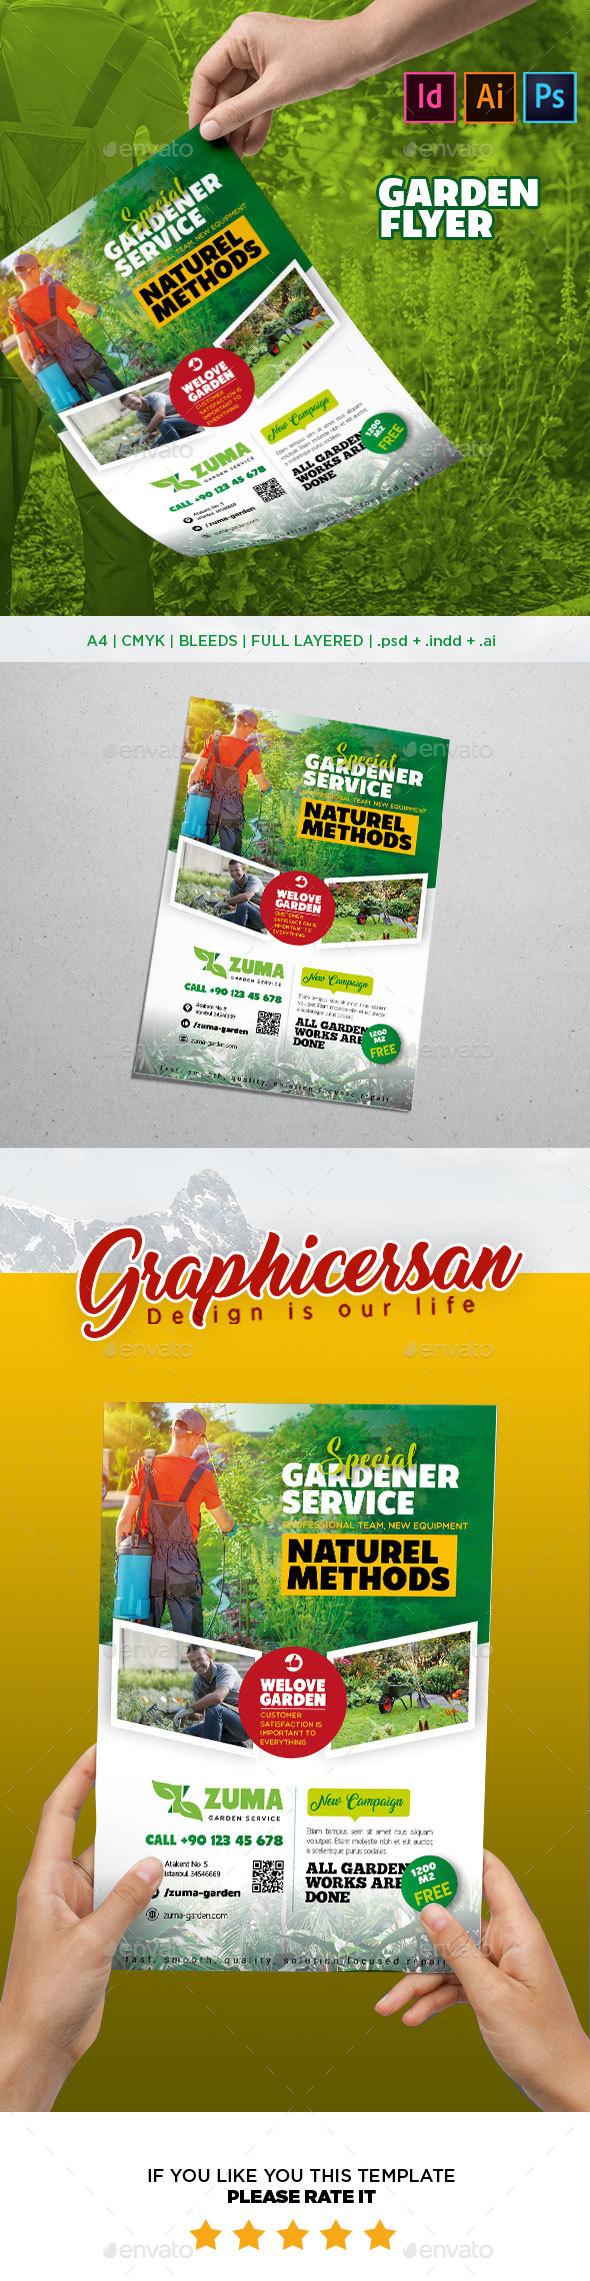 GraphicRiver Garden Flyer Template 20495398